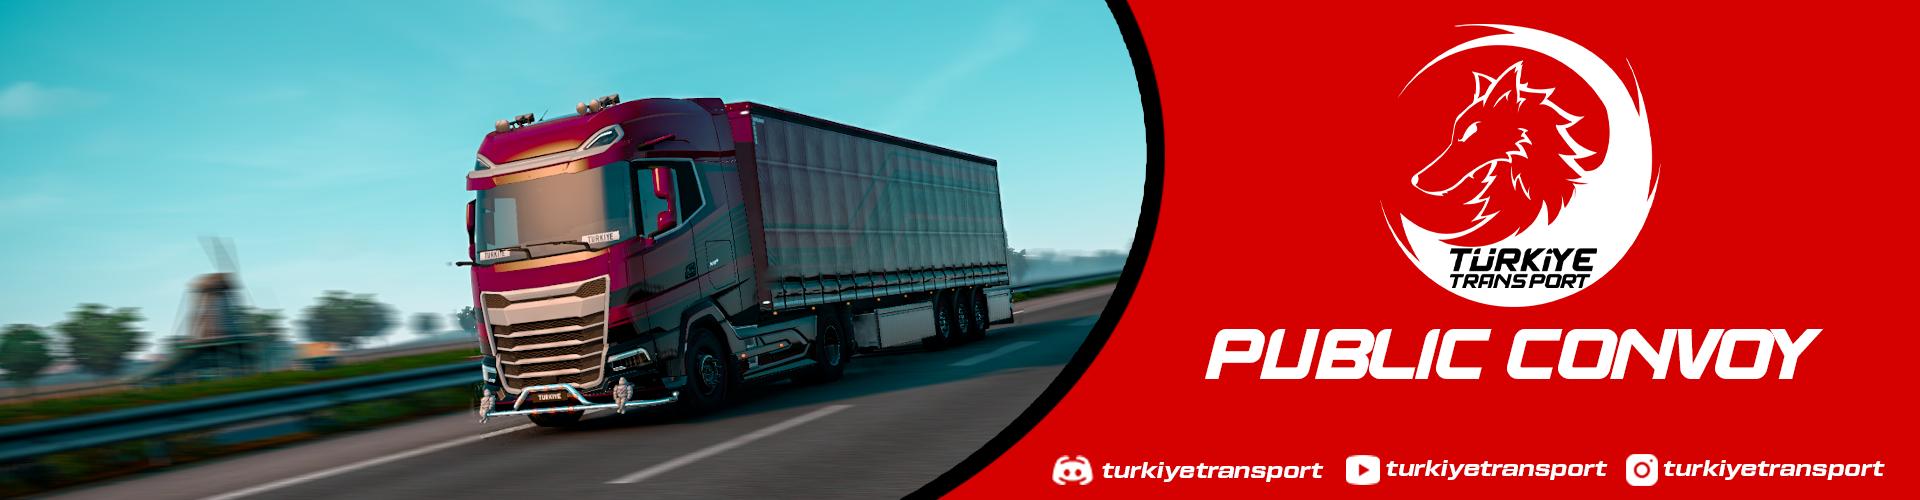 Türkiye Transport September Convoy